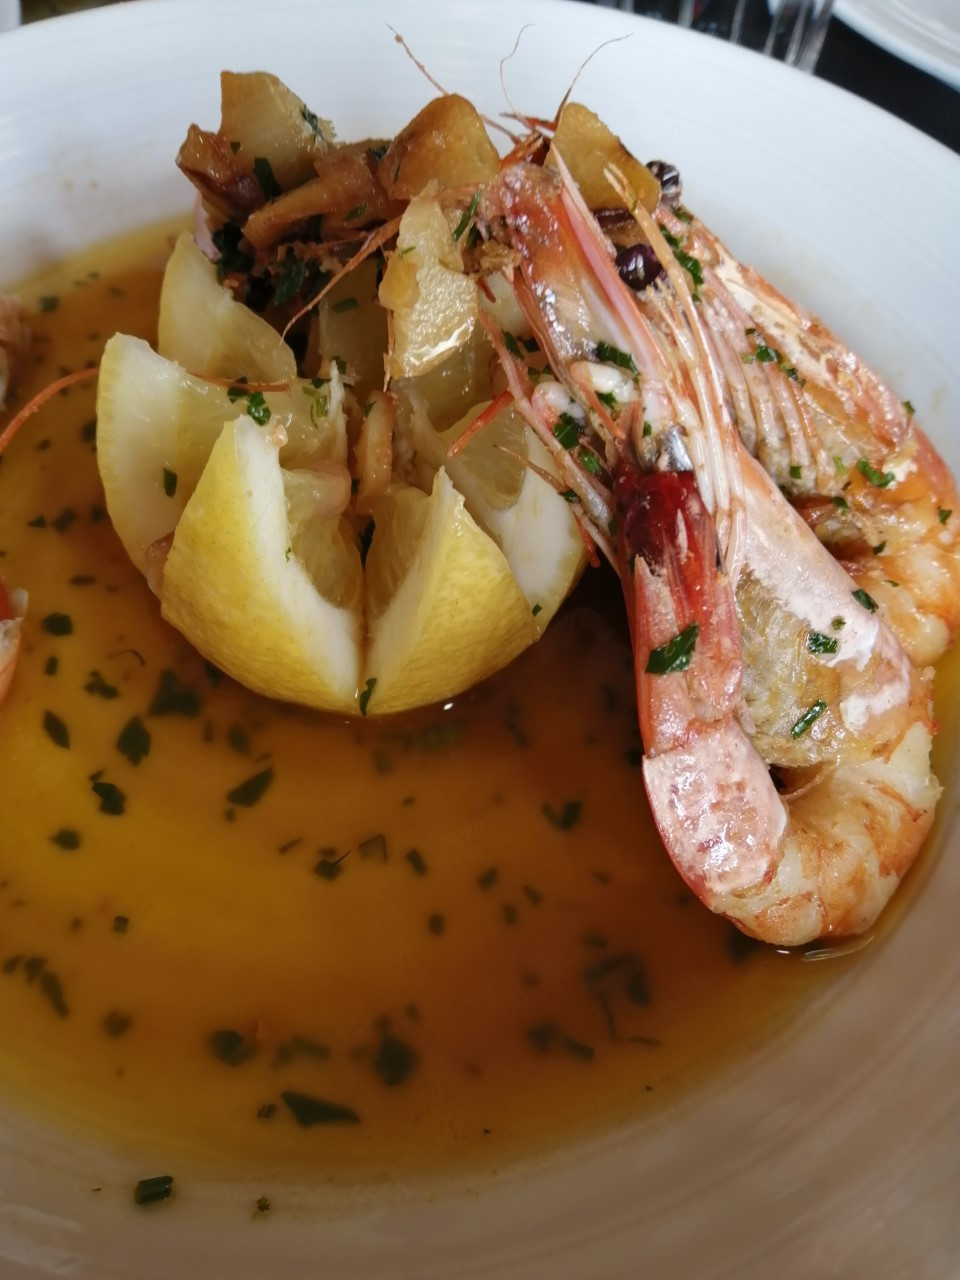 Delicias do restaurante  Falésia